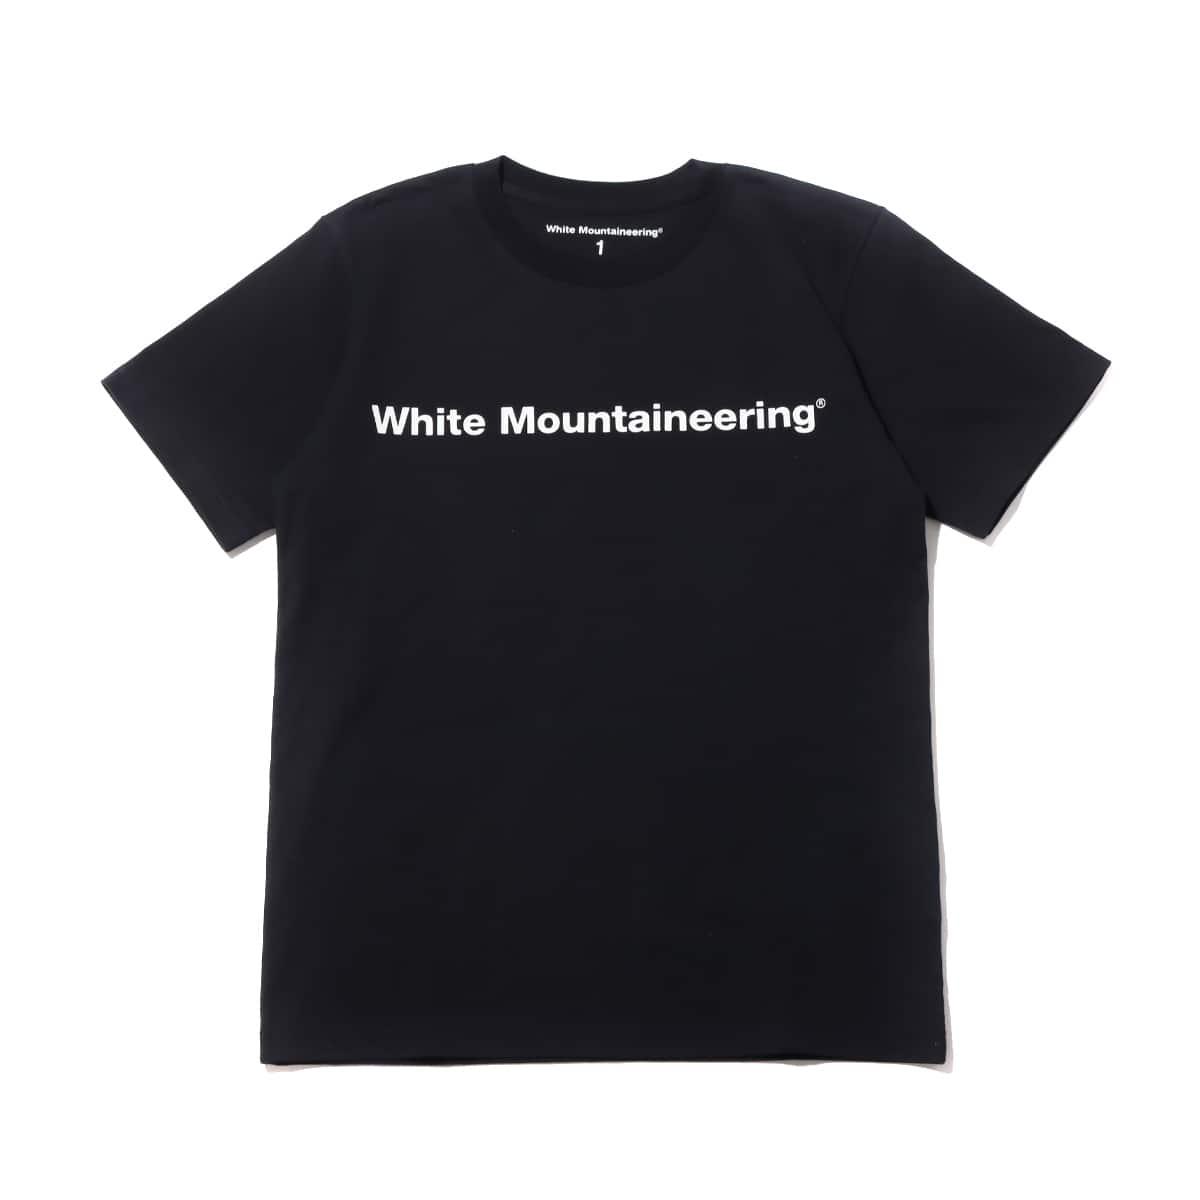 WHITE MOUNTAINEERING SIDE WM LOGO PRINTED T-SHIRT BLACK 21SP-I_photo_large